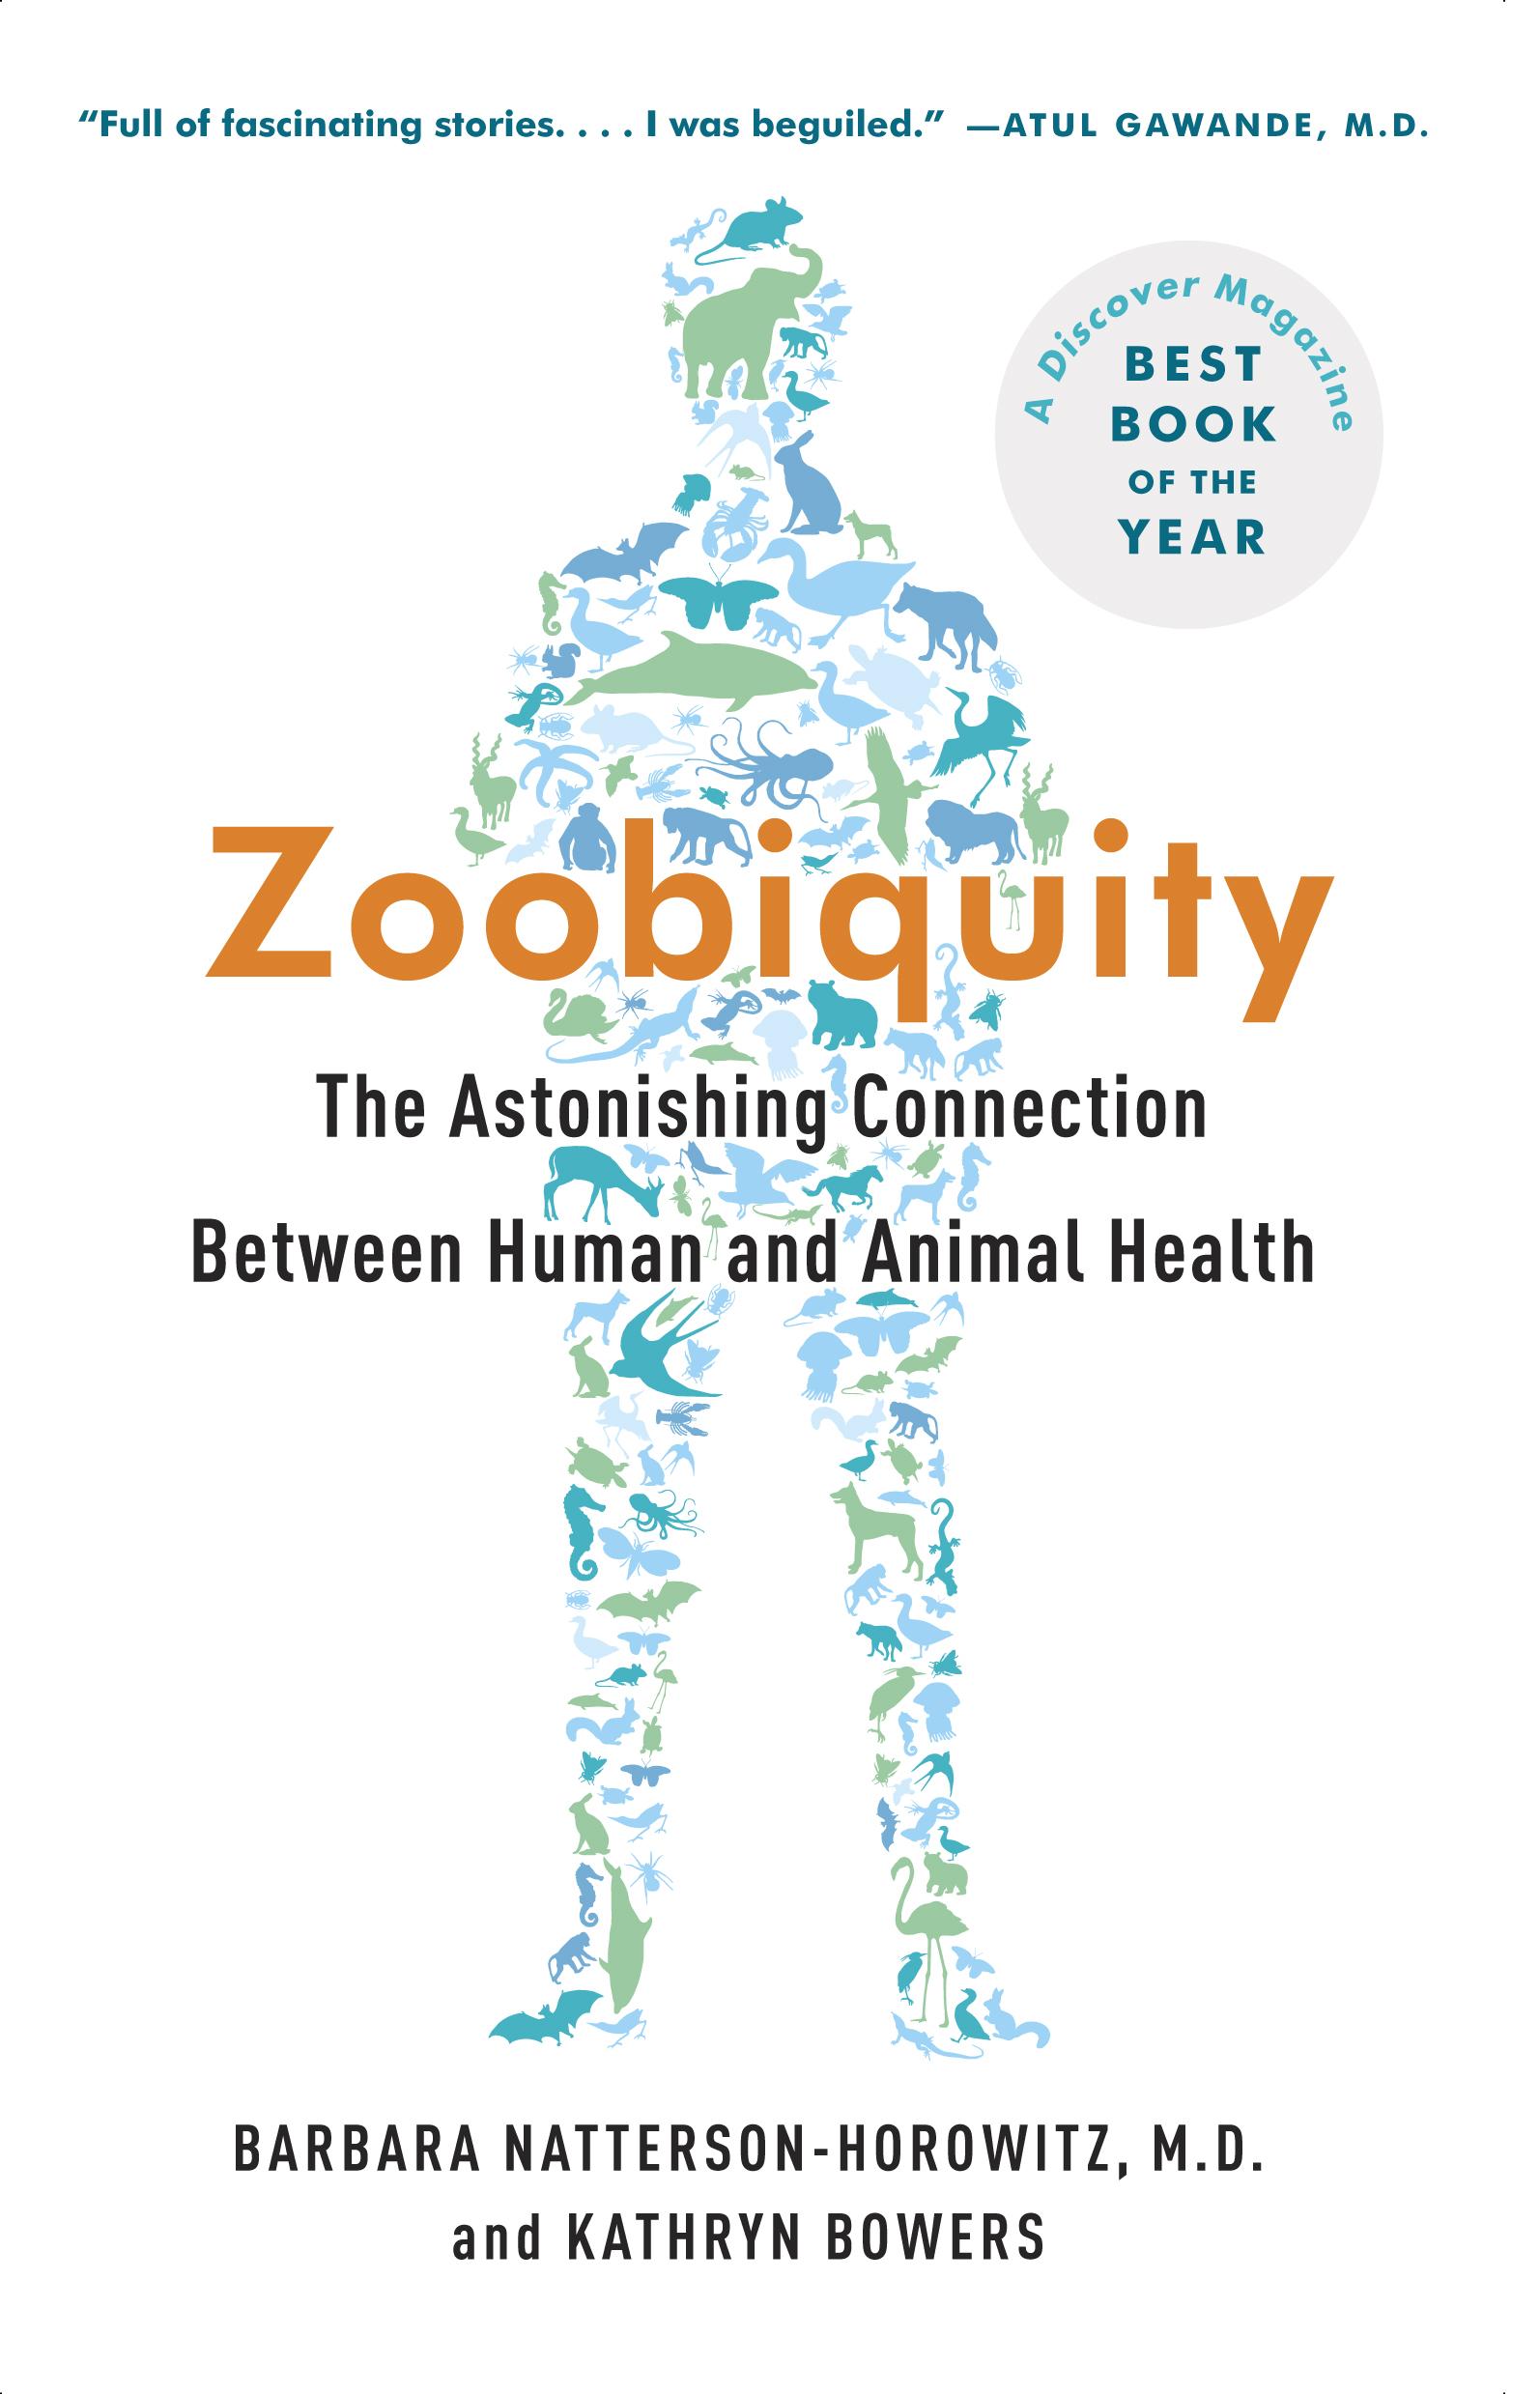 Zoobiquity_Paperback_CoverArt_HighResolution.jpg